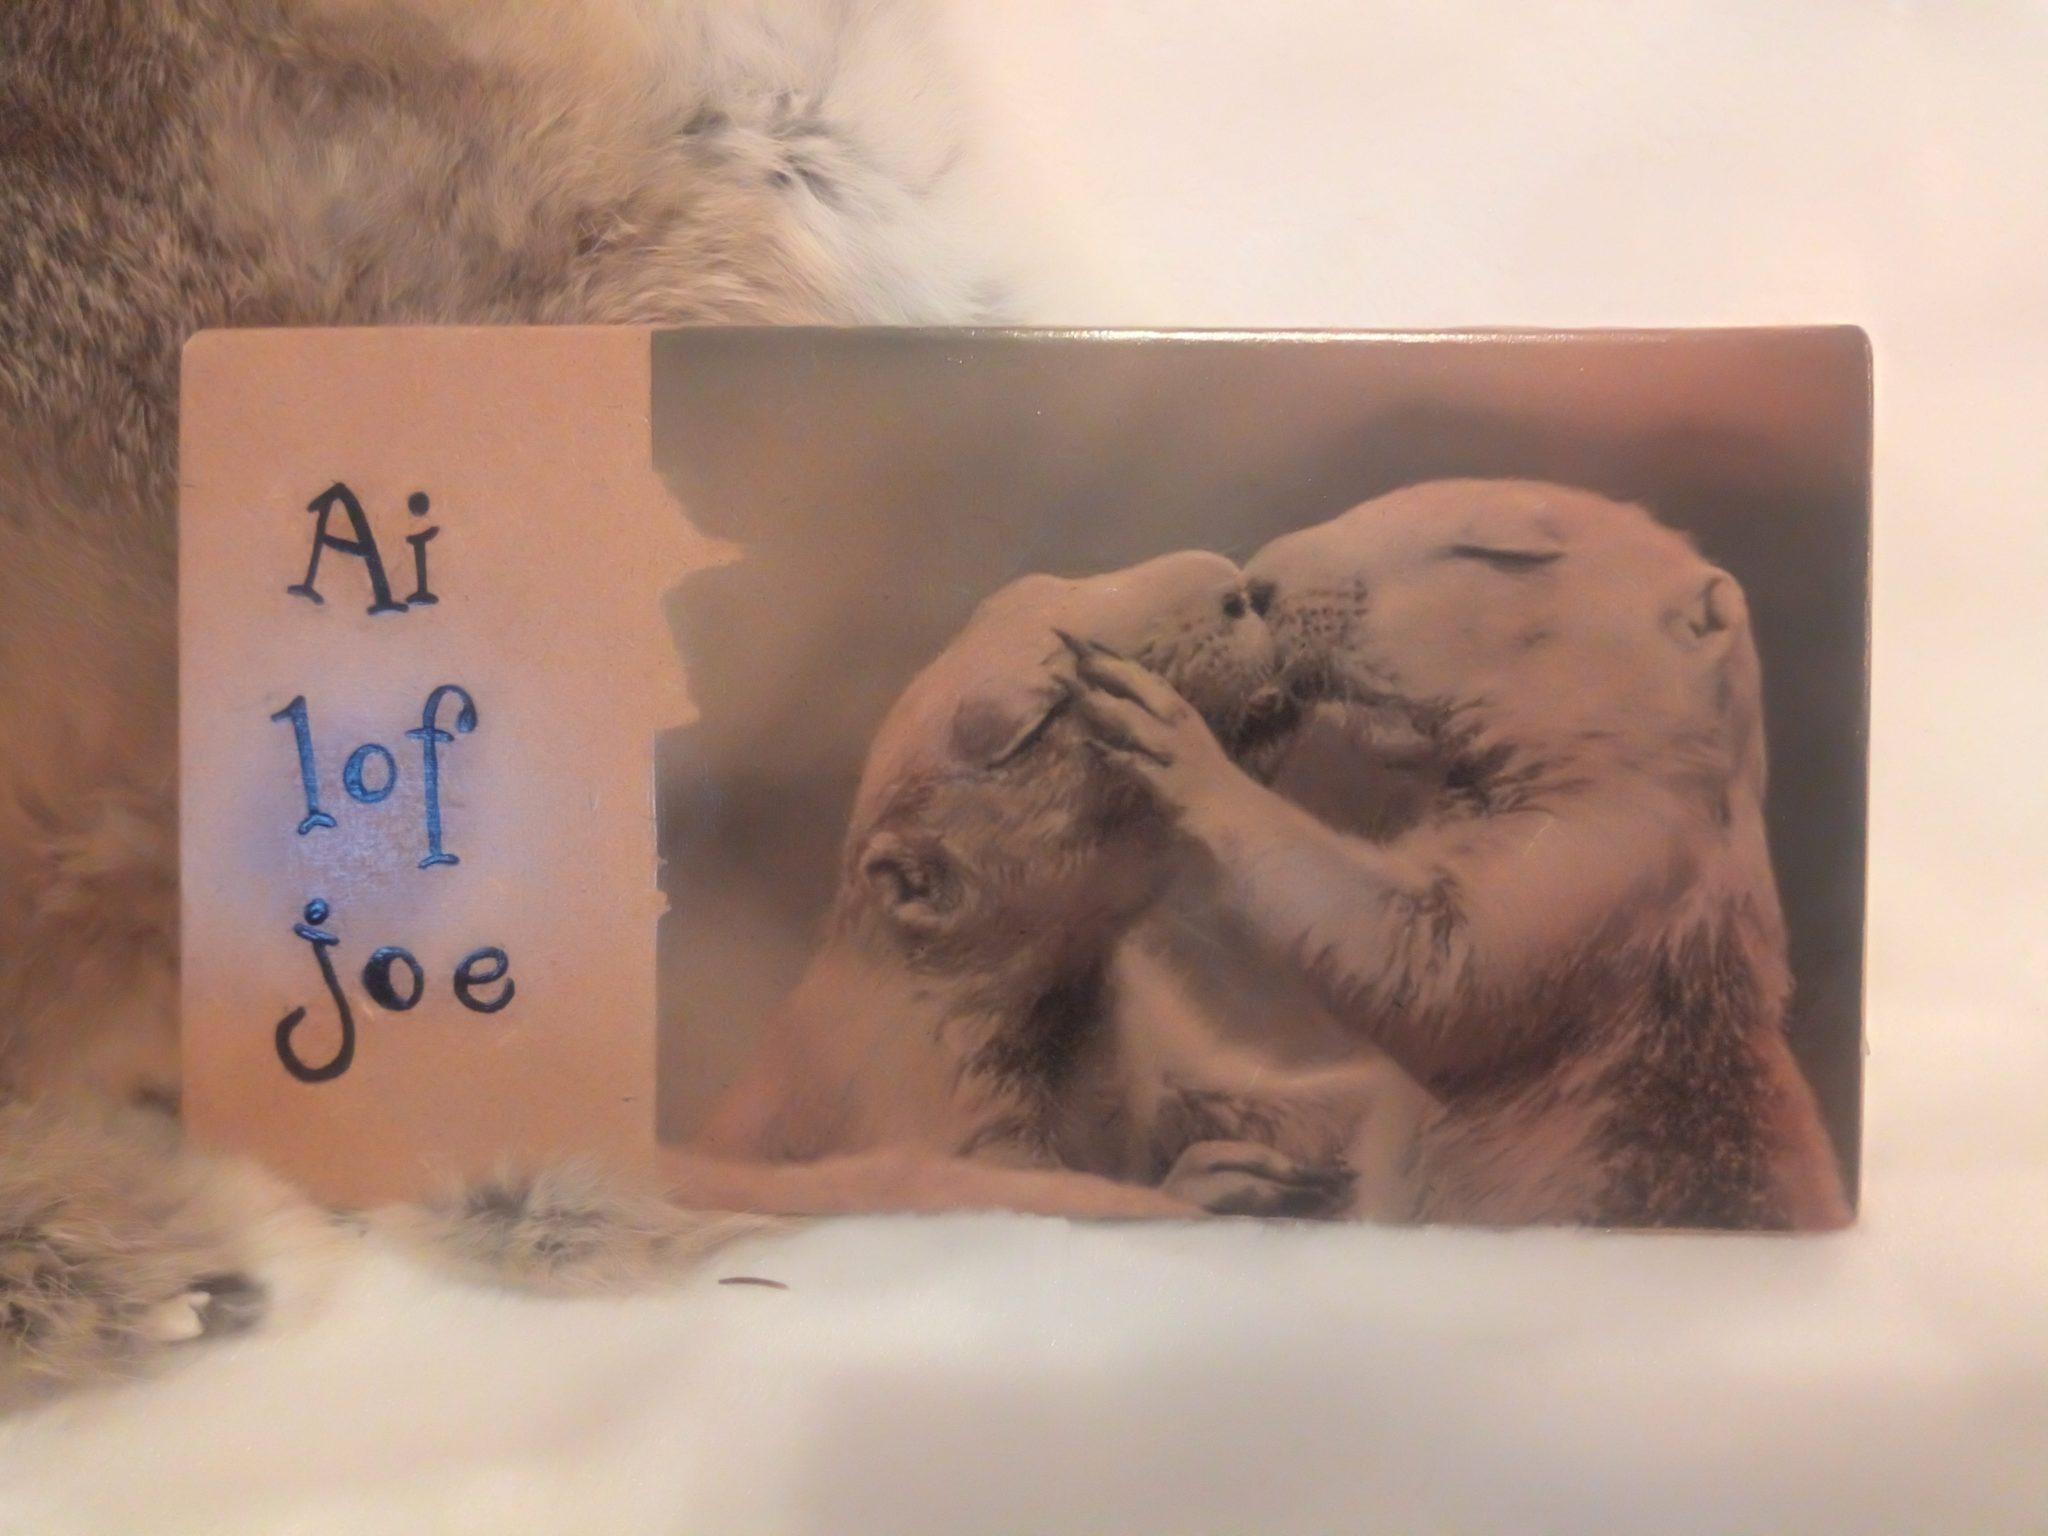 Deco-bordje: Grondeekhoorntjes - Ai lof joe